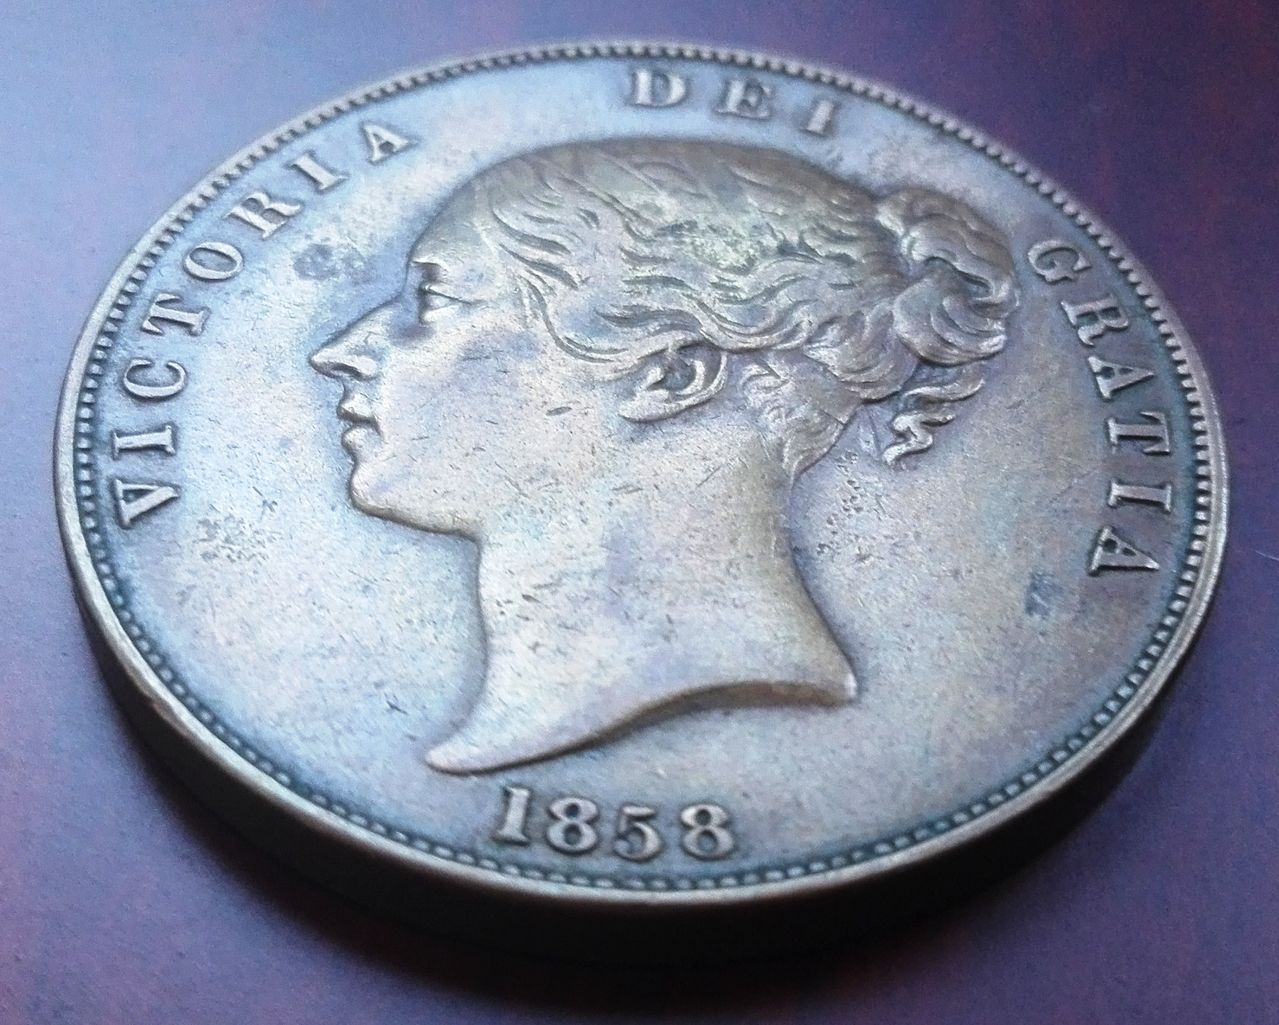 1 penique 1858, Gran Bretaña. Reina Victoria 1_penique_1858_anv_2